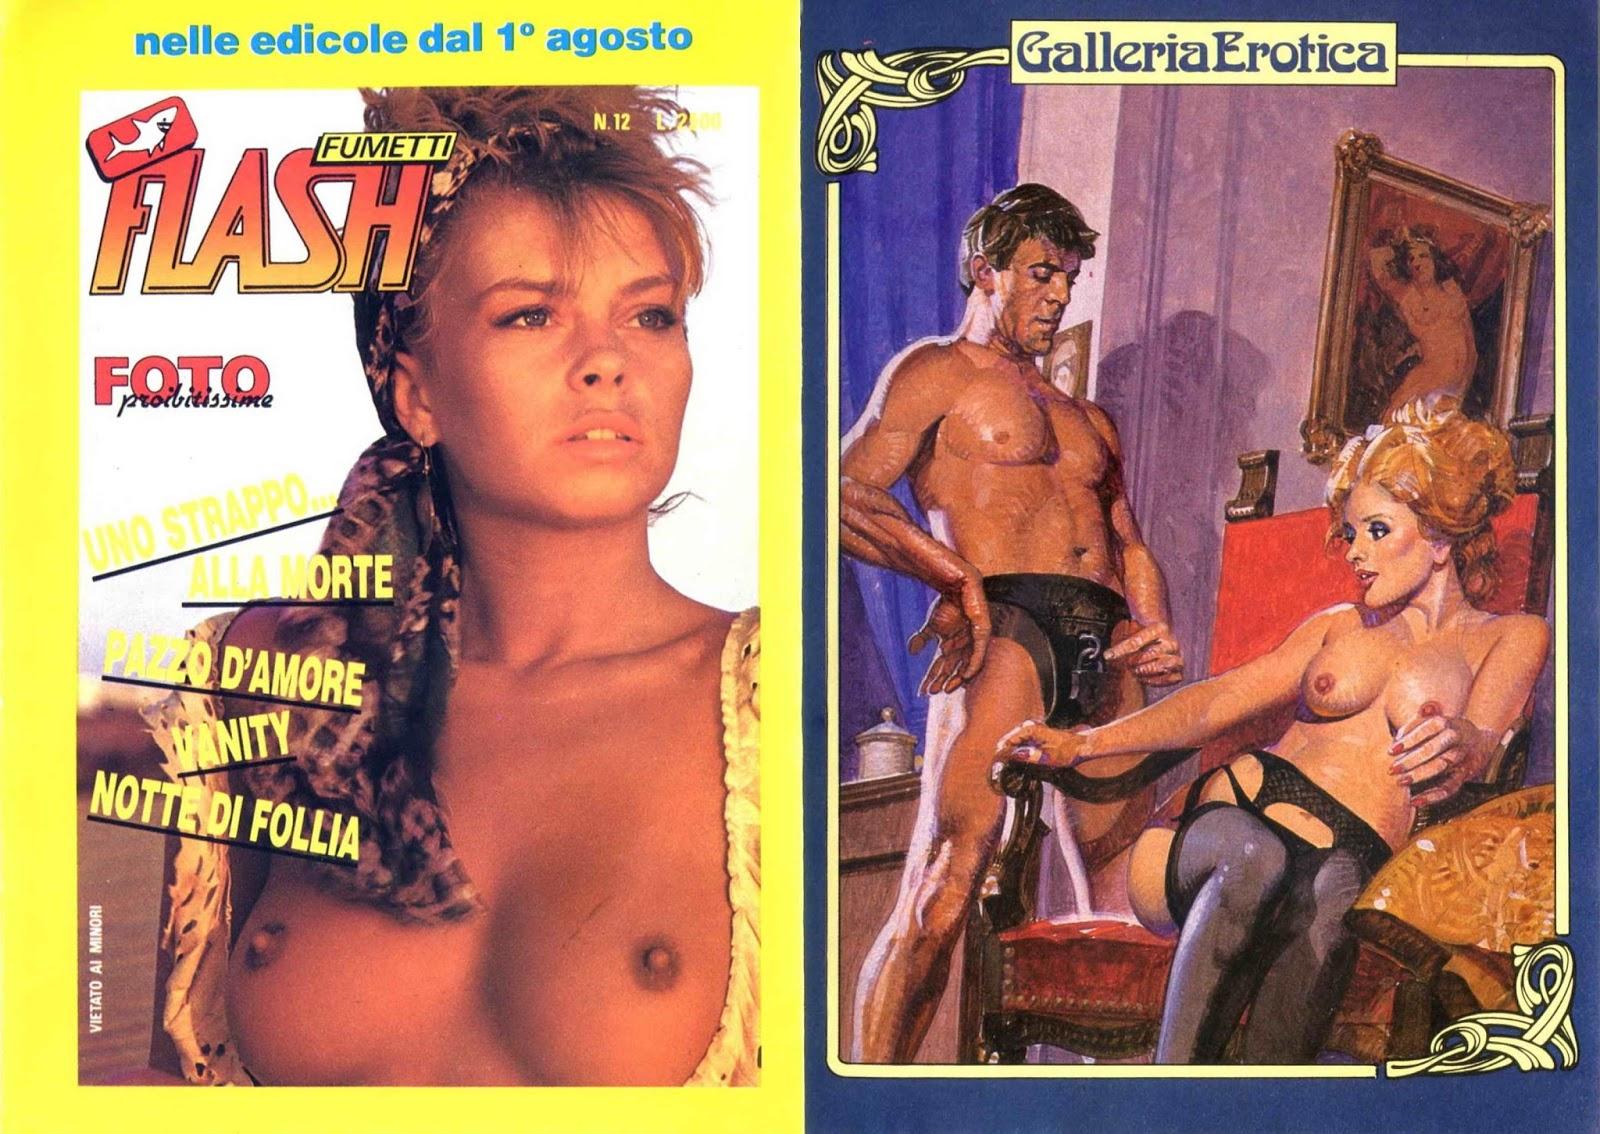 Erotic fairy tale